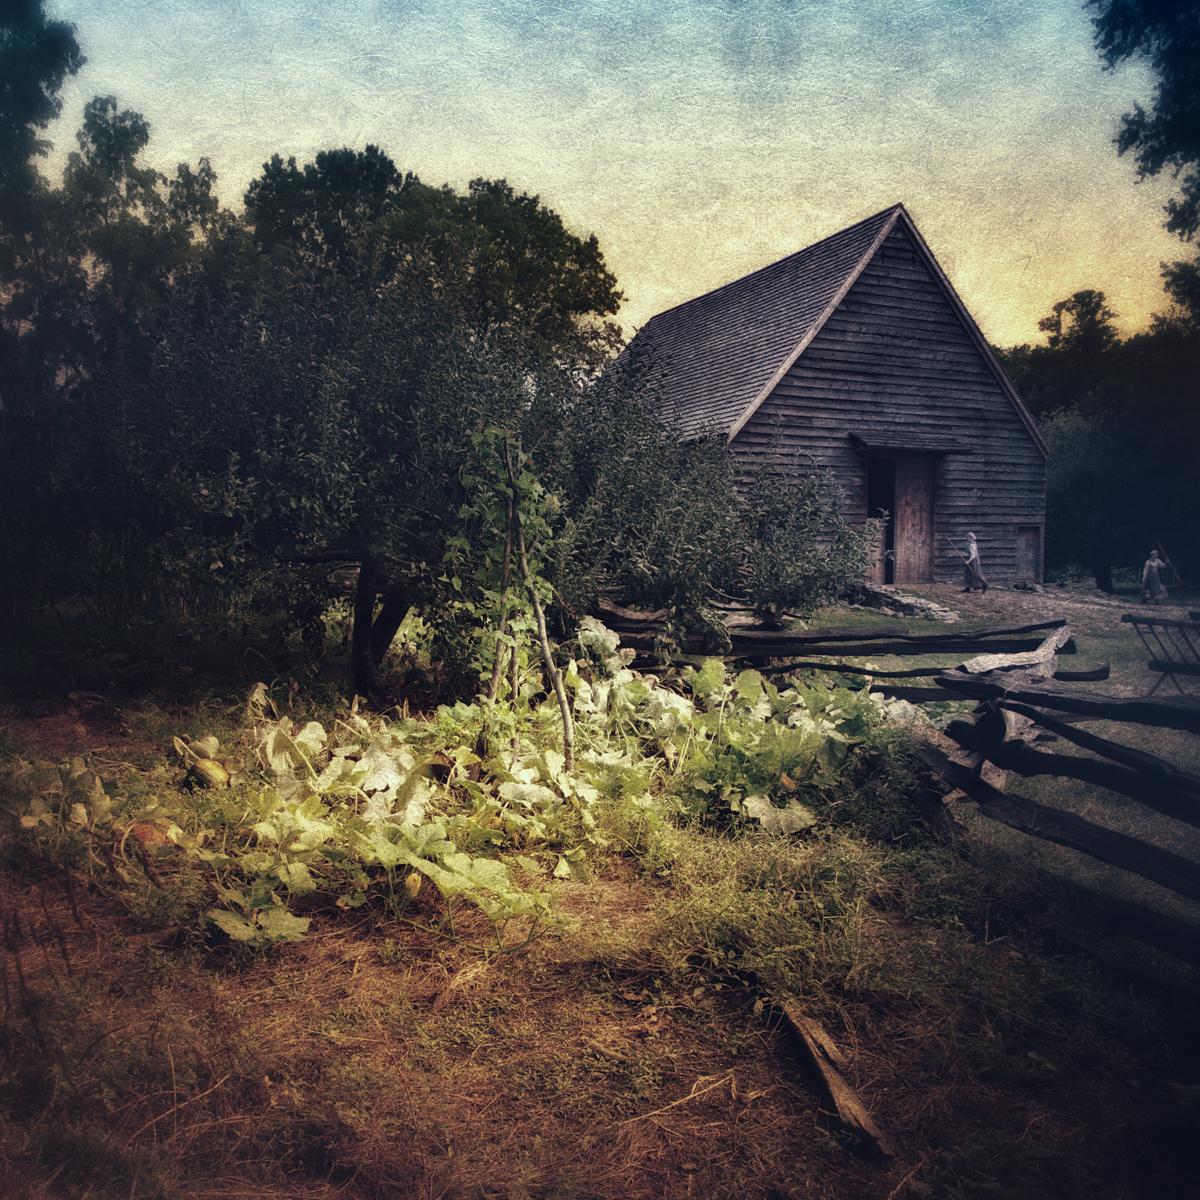 Barn at Philipsburg Manor in Sleepy Hollow, a perfect setting for American folk horror.